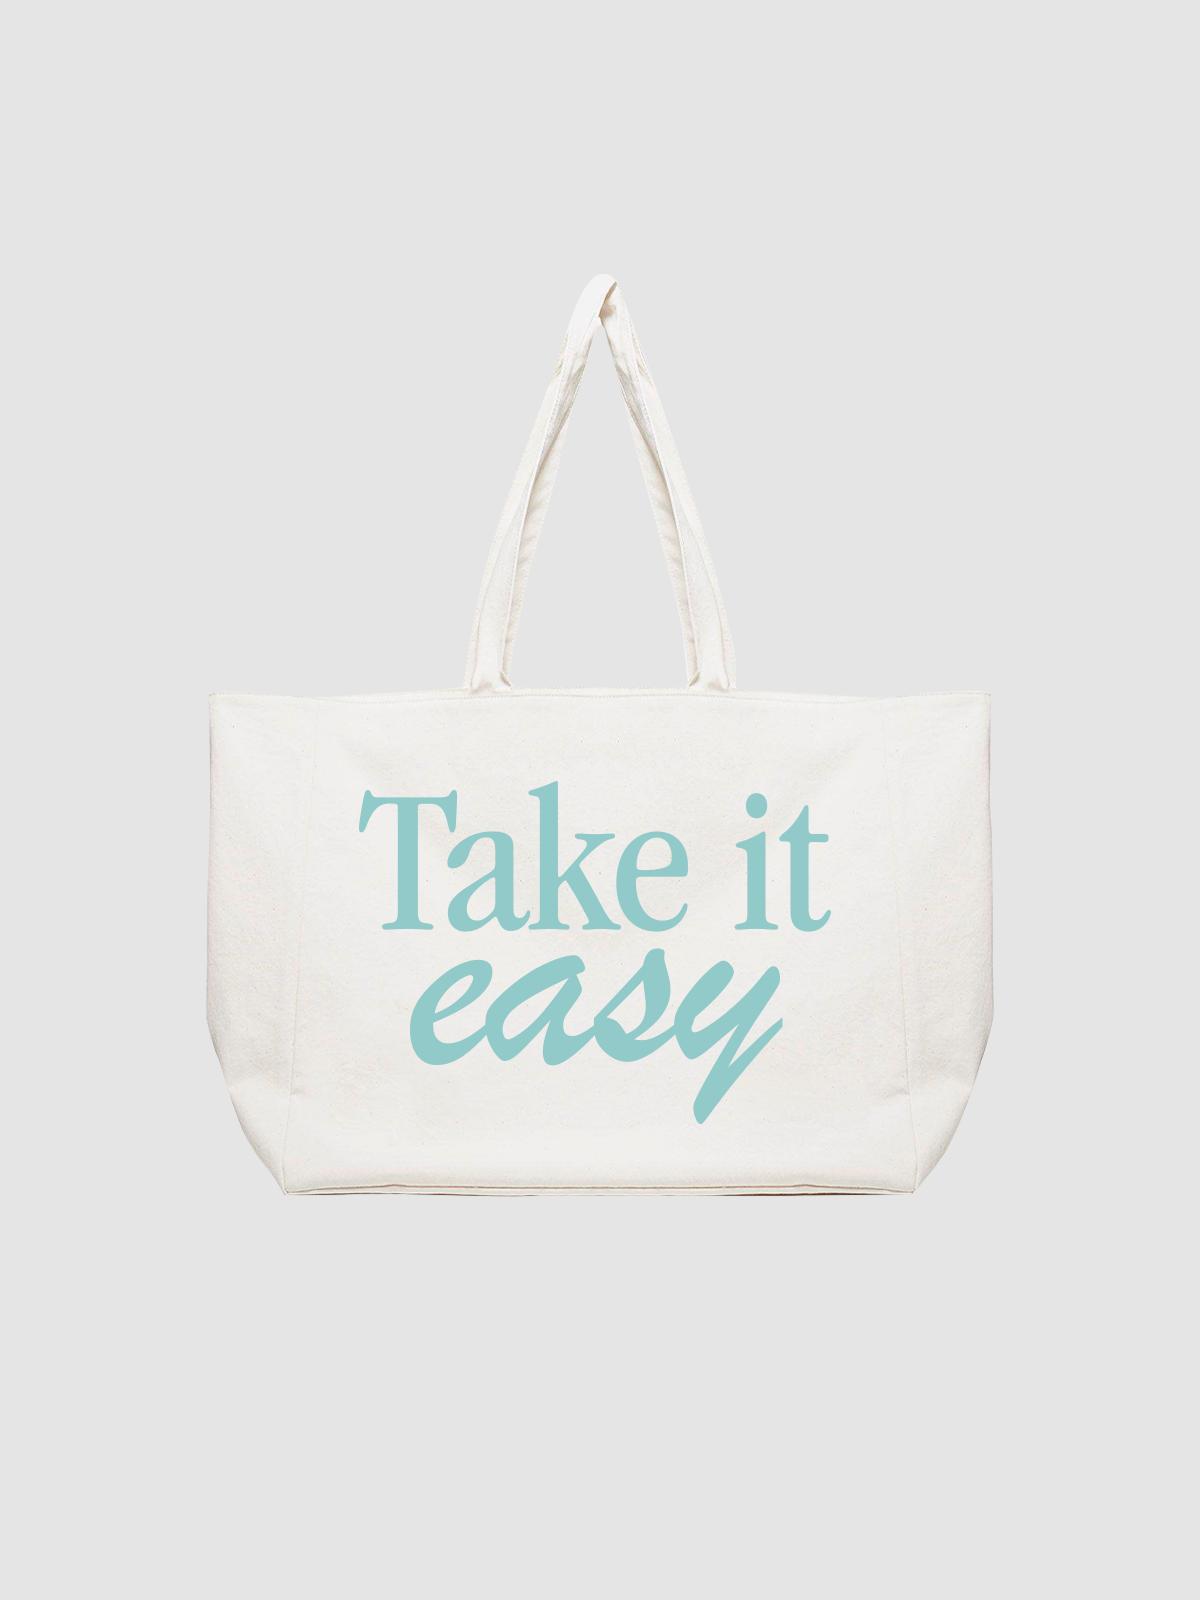 A tote bag mockup